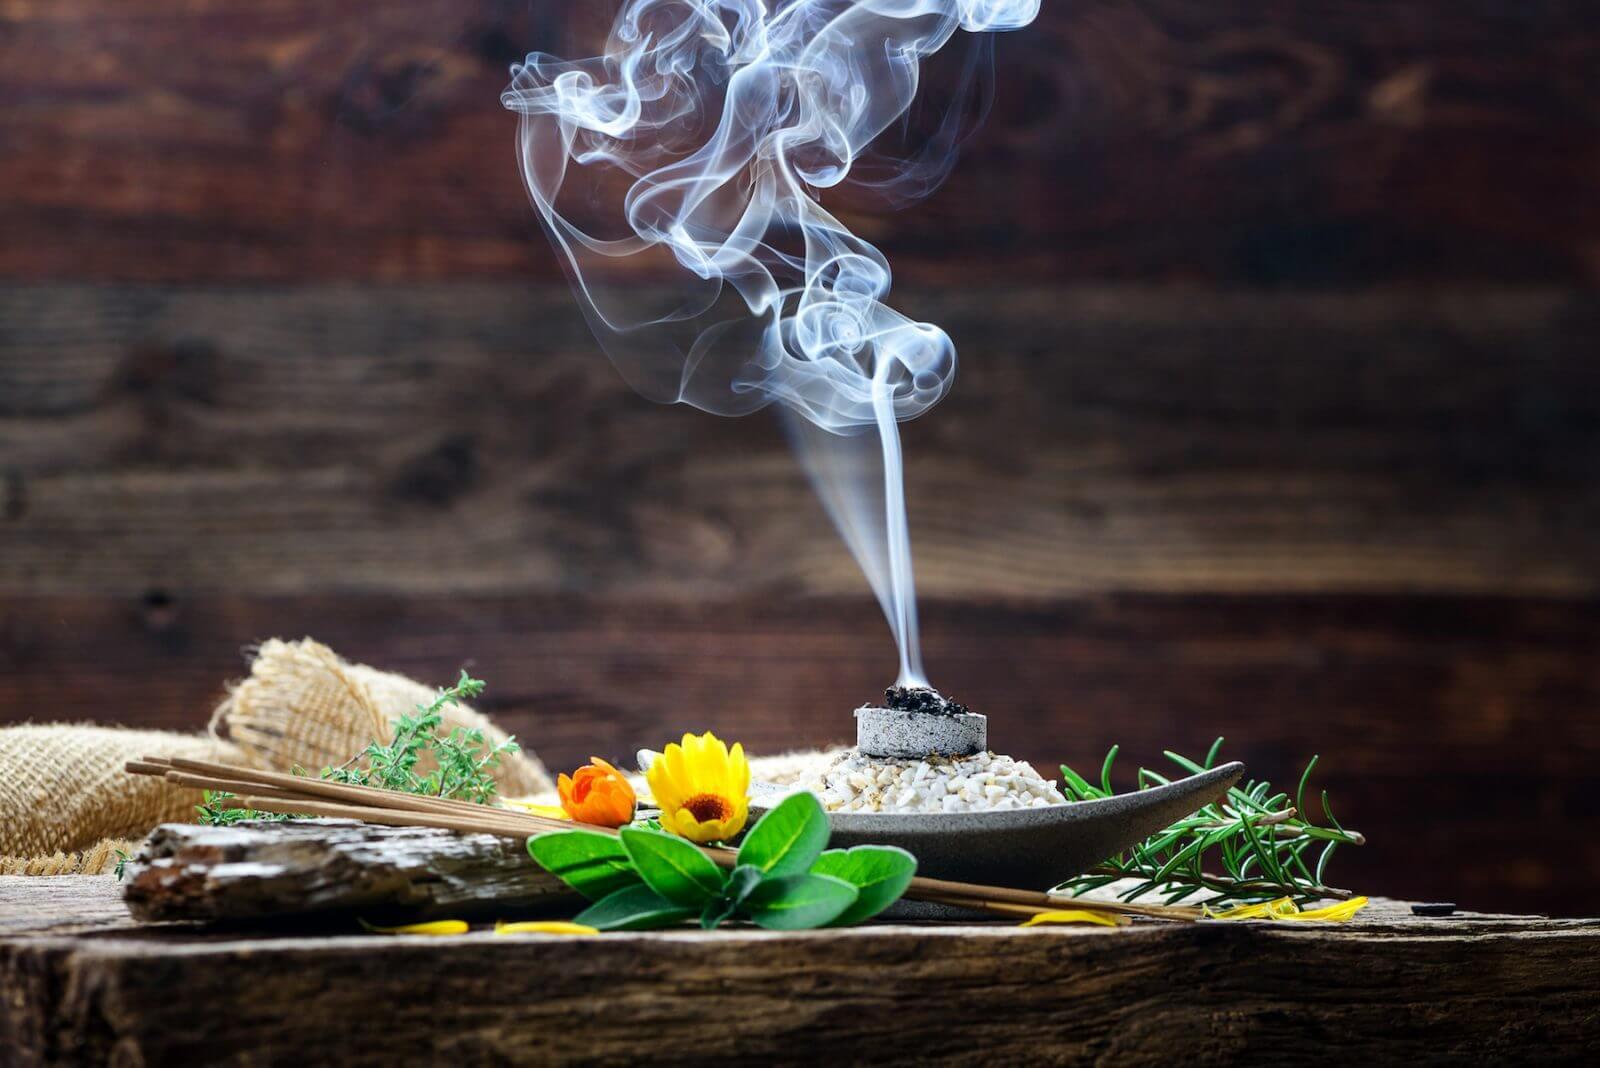 costumbres y rituales